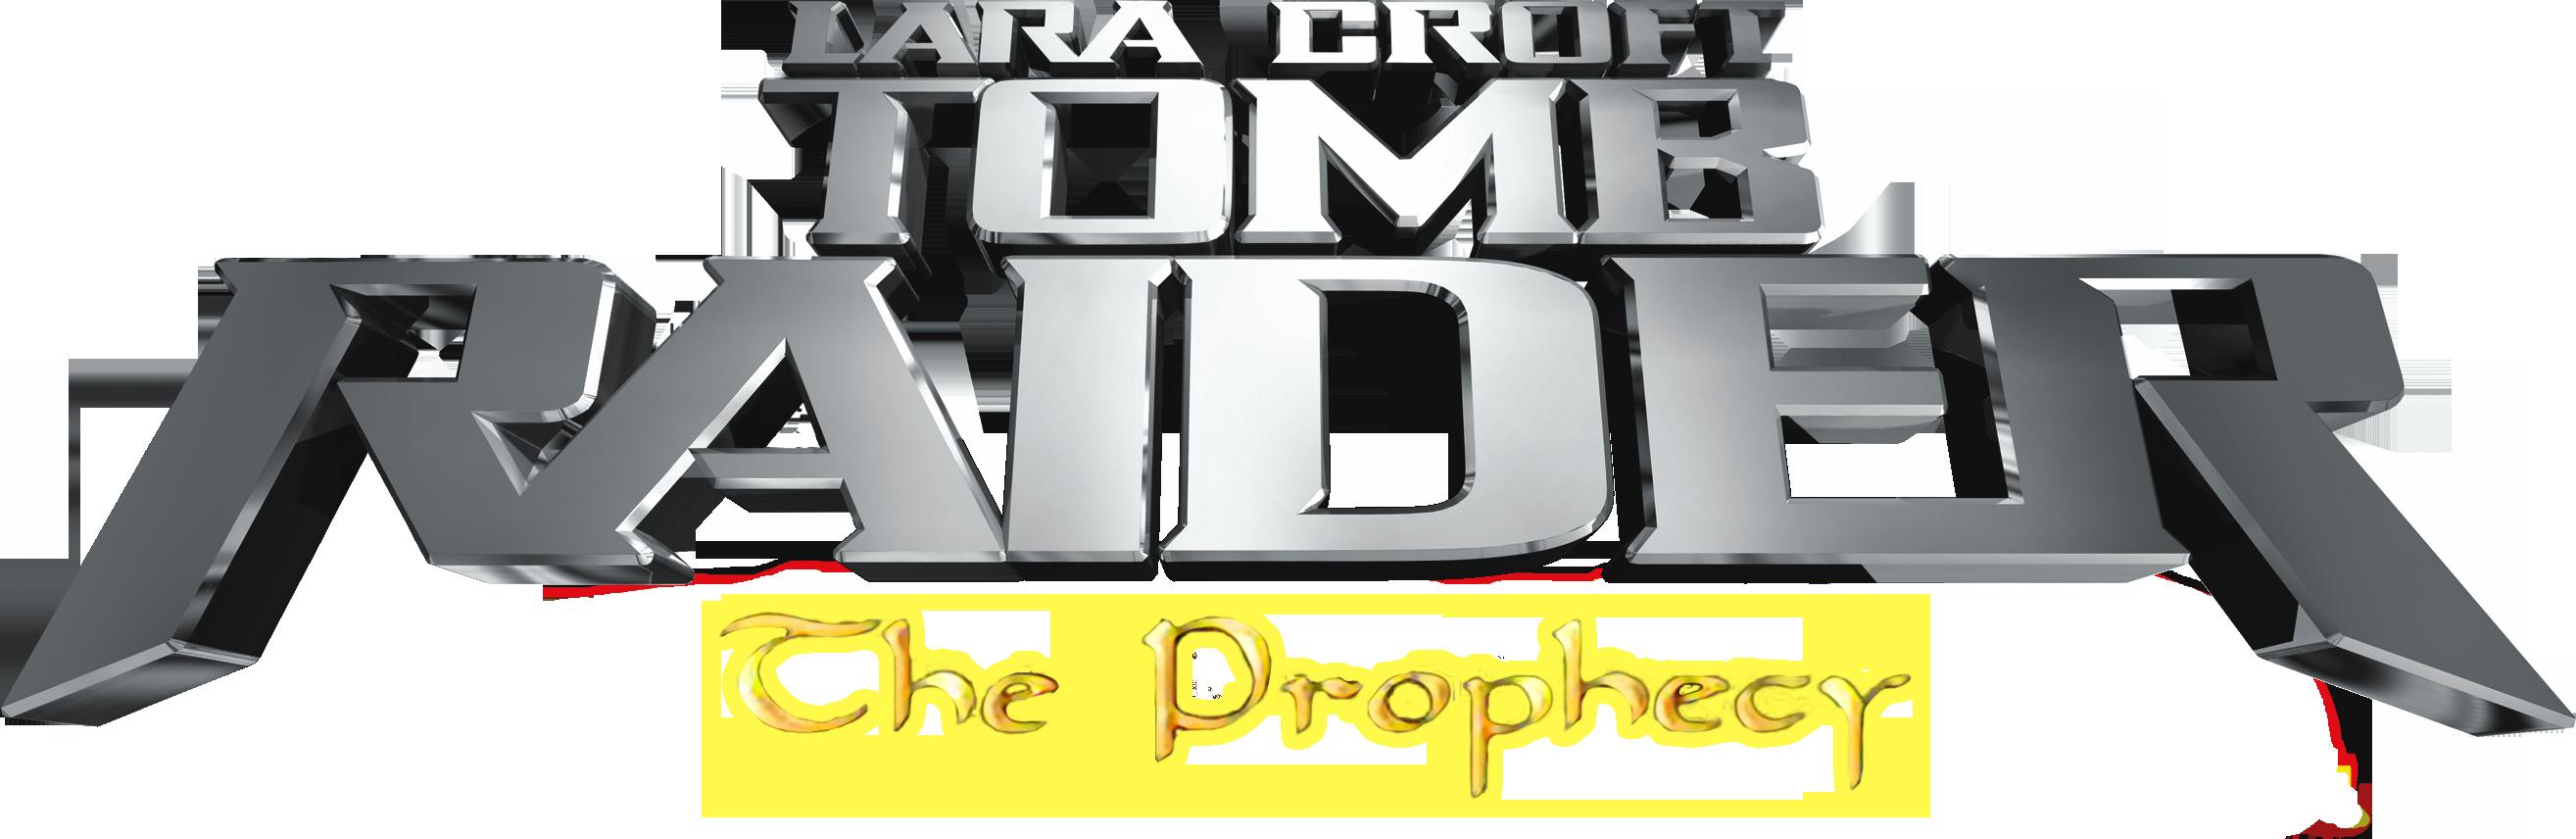 Tomb Raider Logo PNG Clipart-Tomb Raider Logo PNG Clipart-9